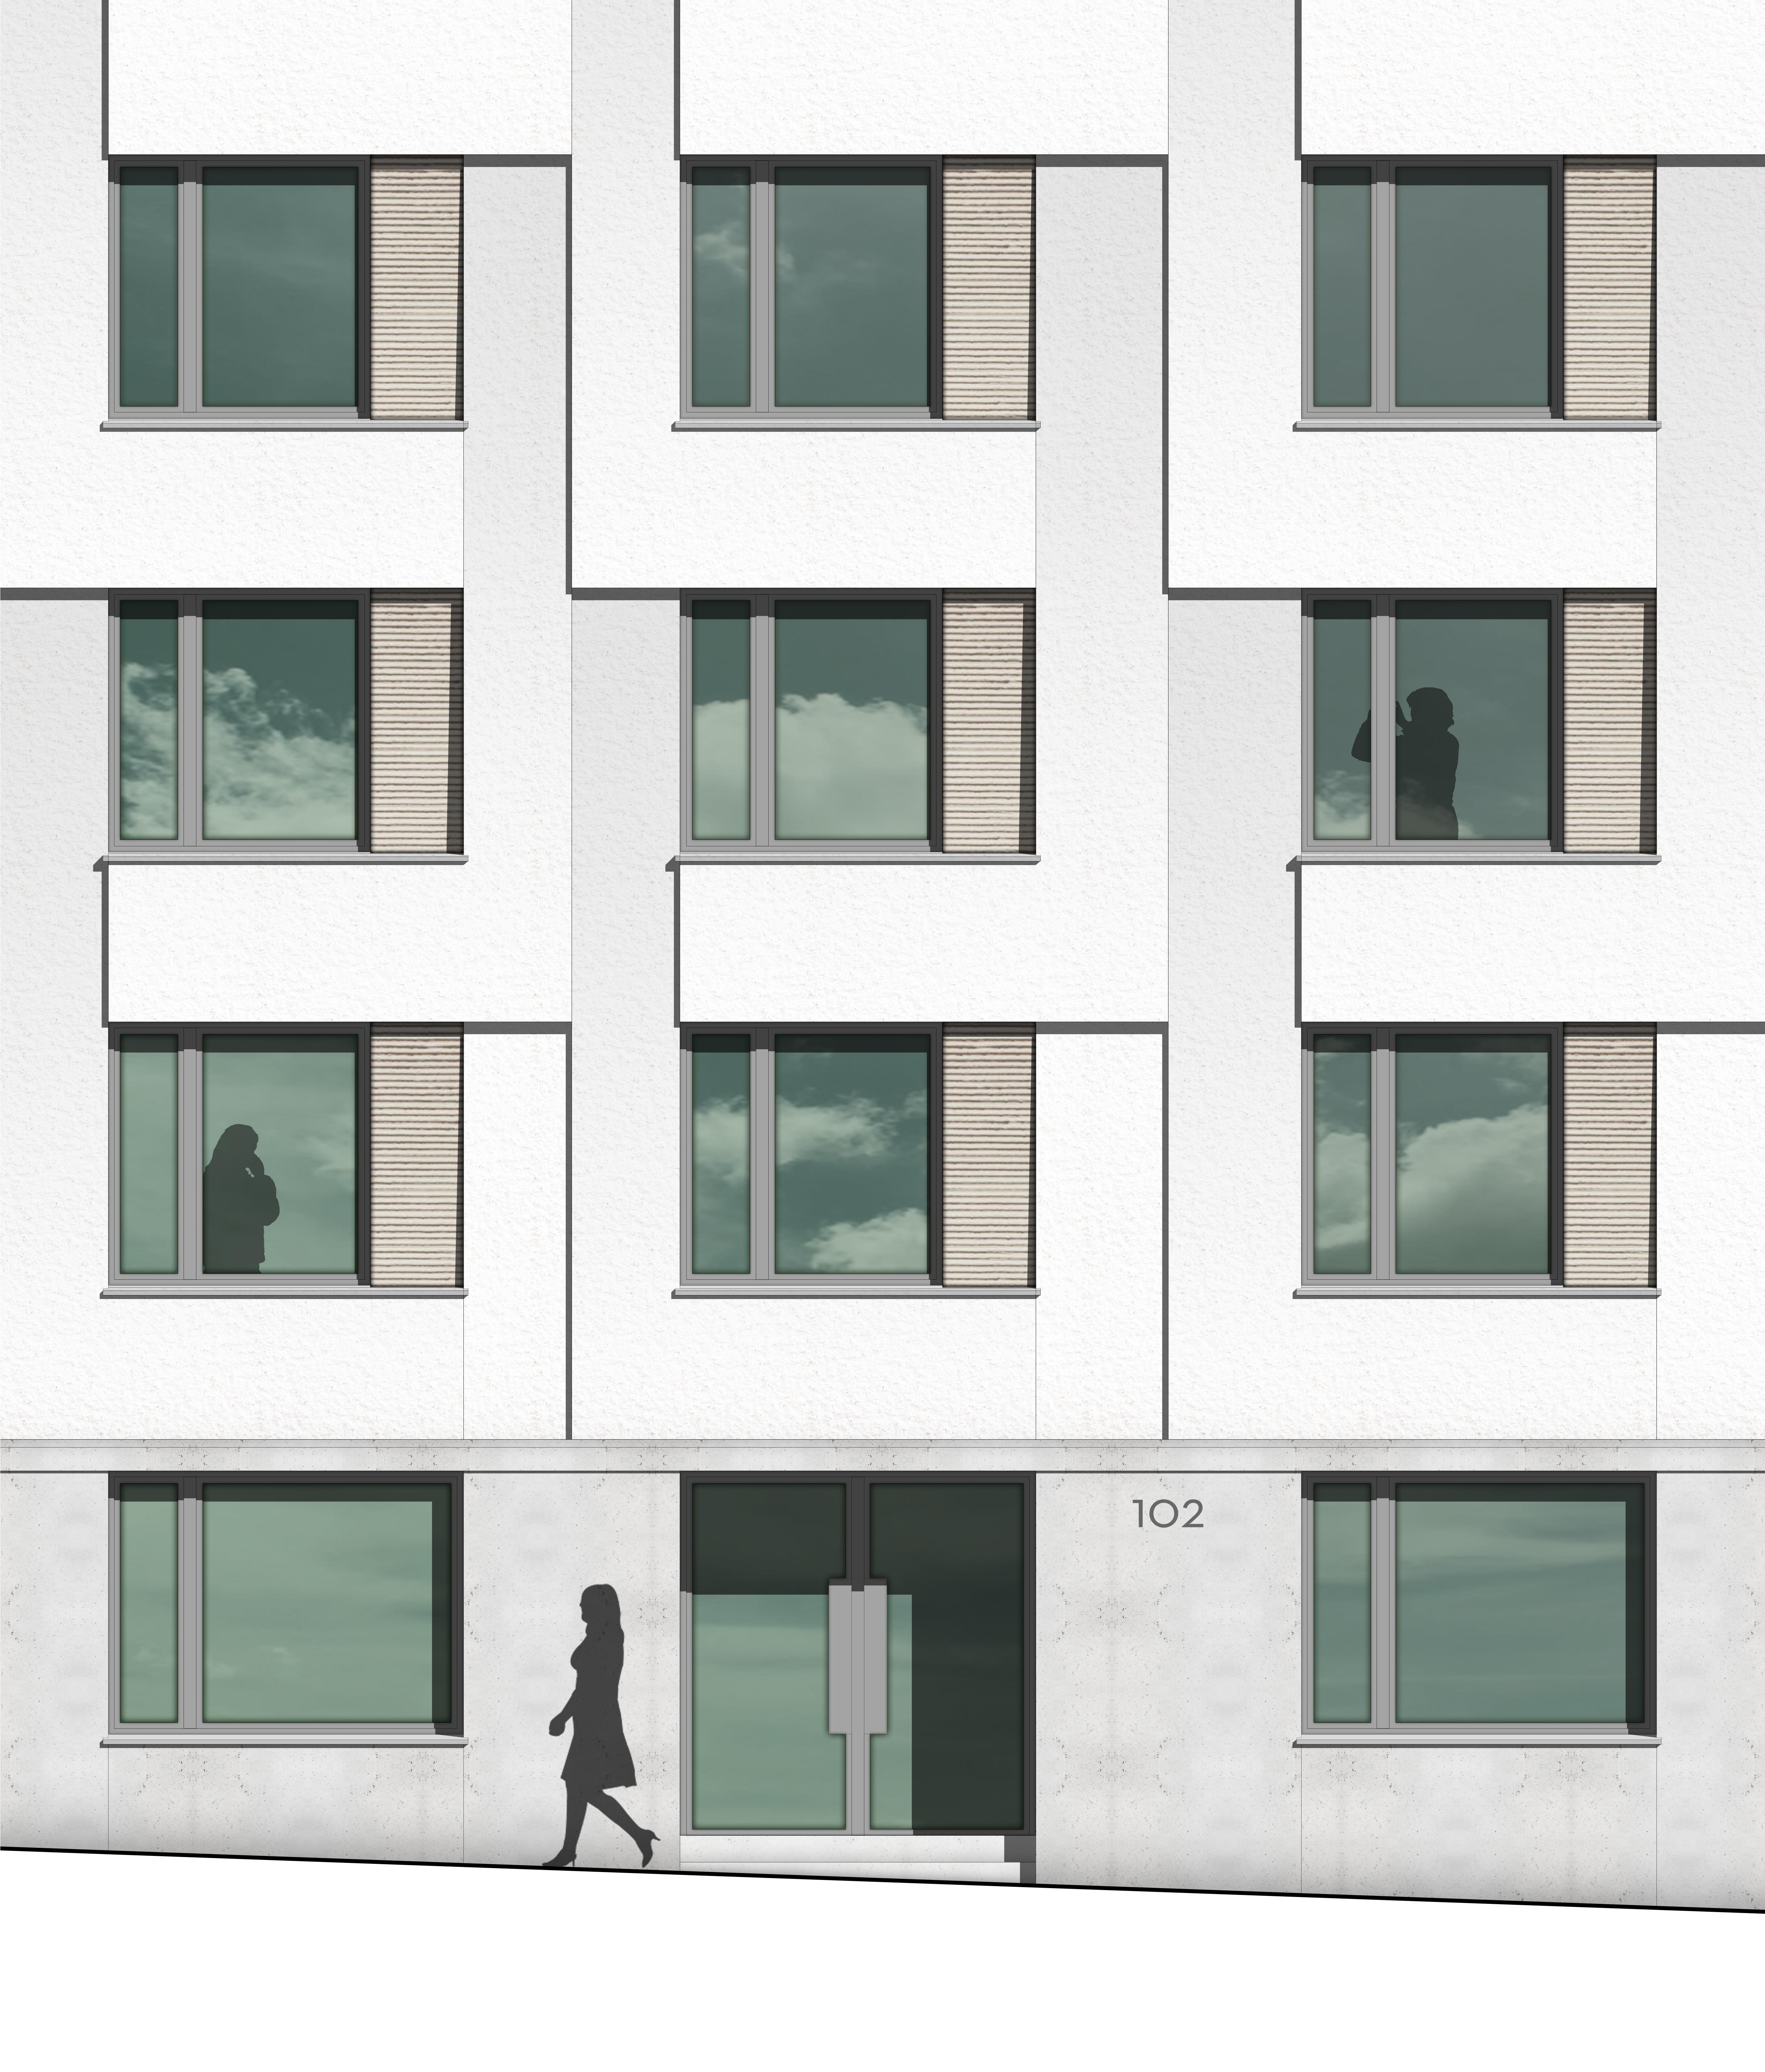 kaestle&ocker - Machbarkeitsstudie Personalwohngebäude Klinikum Stuttgart